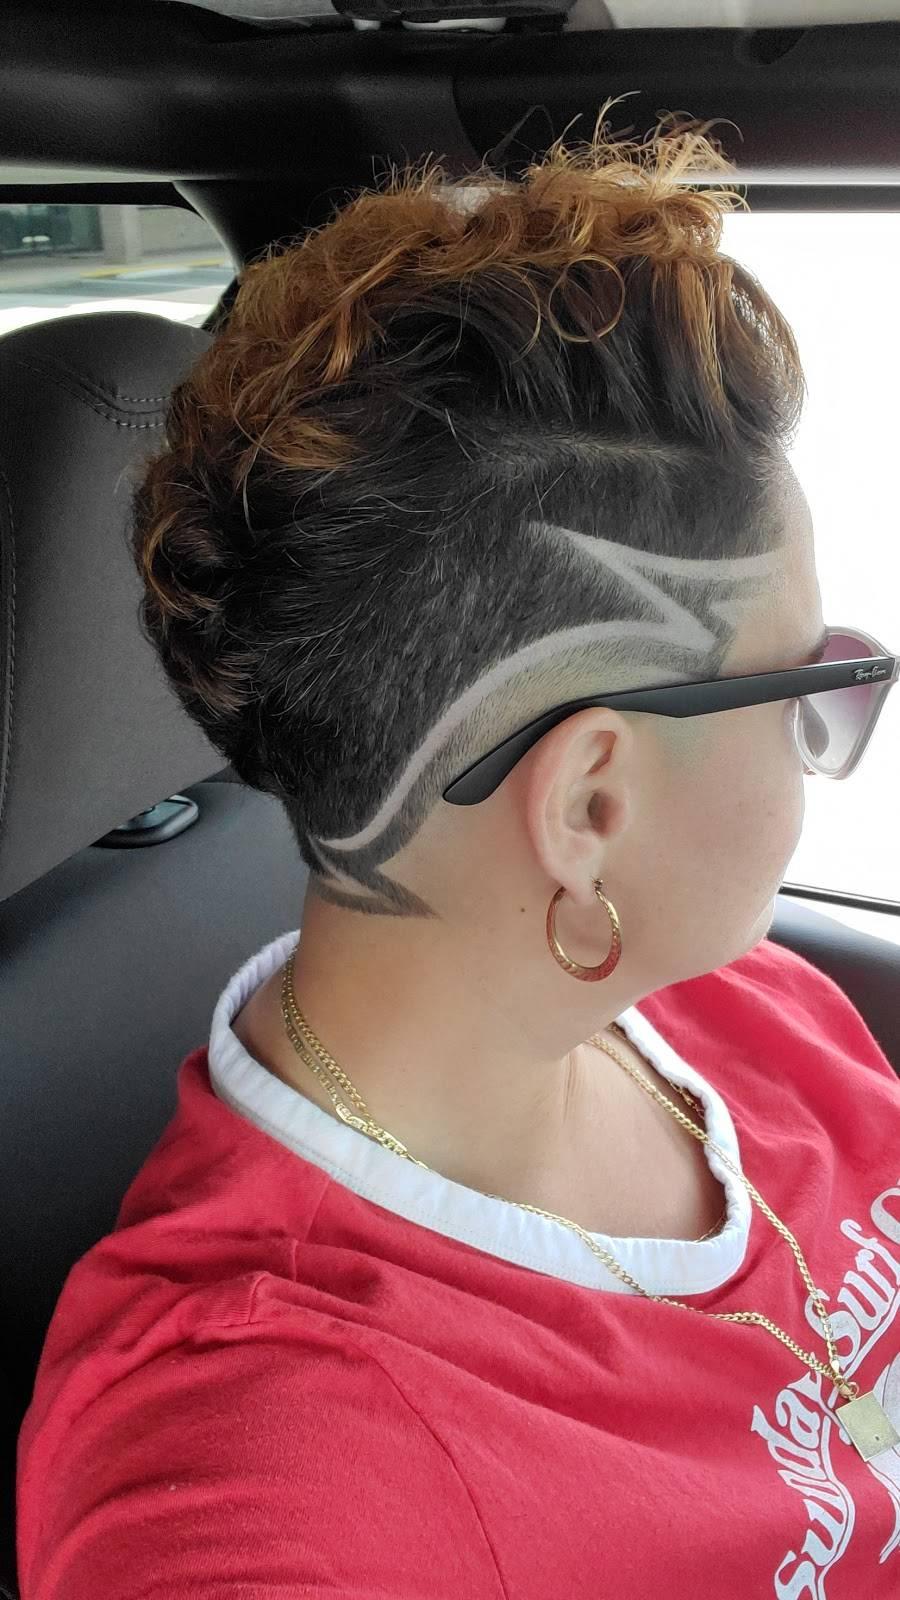 Exclusive Studio Barber Shop & Salon - hair care  | Photo 2 of 2 | Address: 4414 E Independence Blvd, Charlotte, NC 28205, USA | Phone: (704) 957-0673